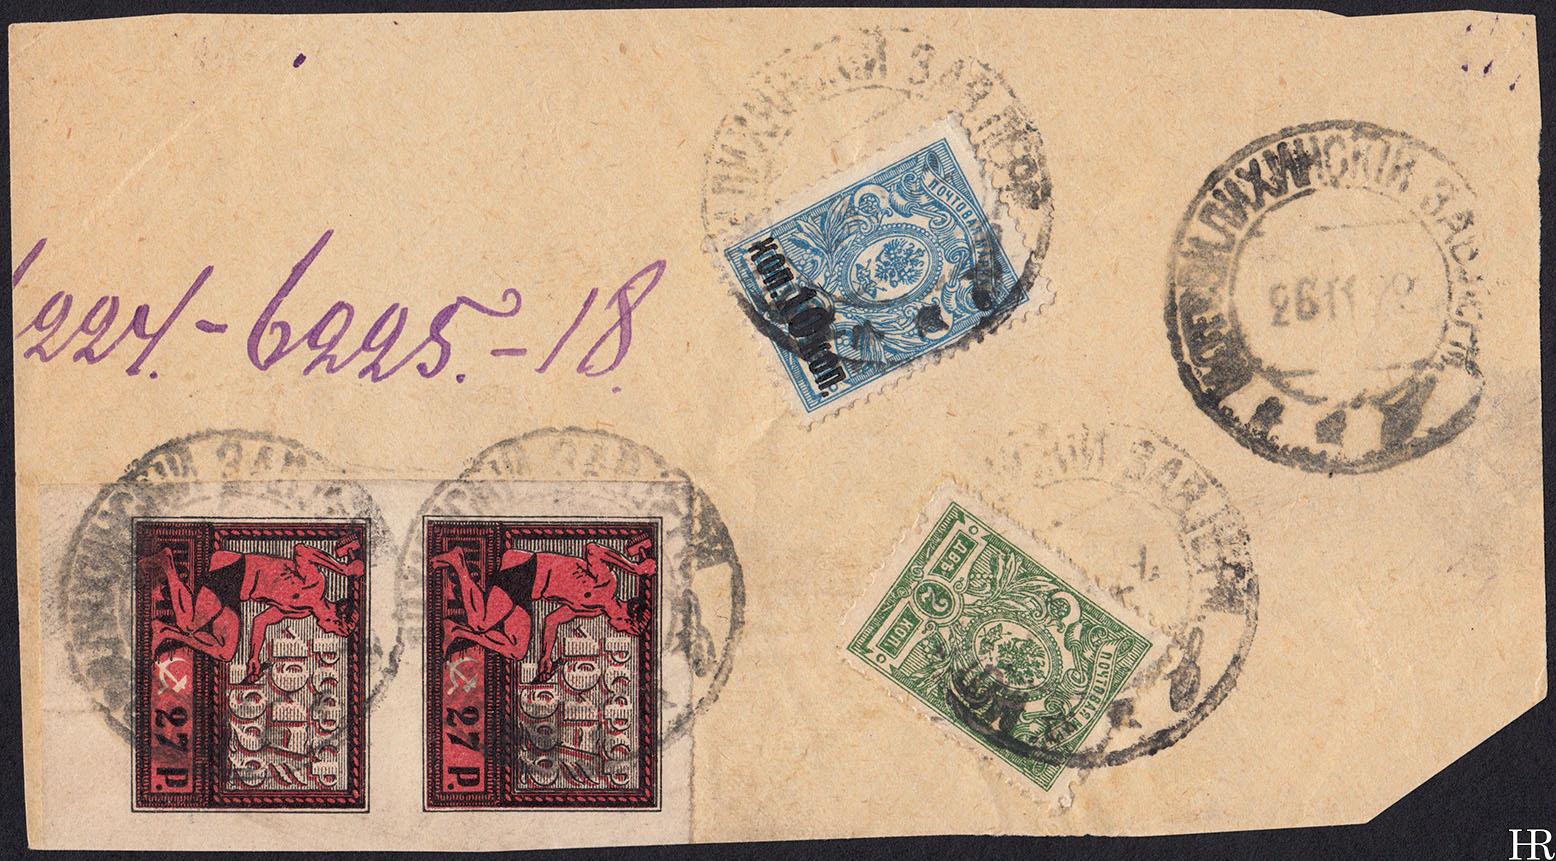 C-RUSSIA-1922-Perm-1a-small.jpg